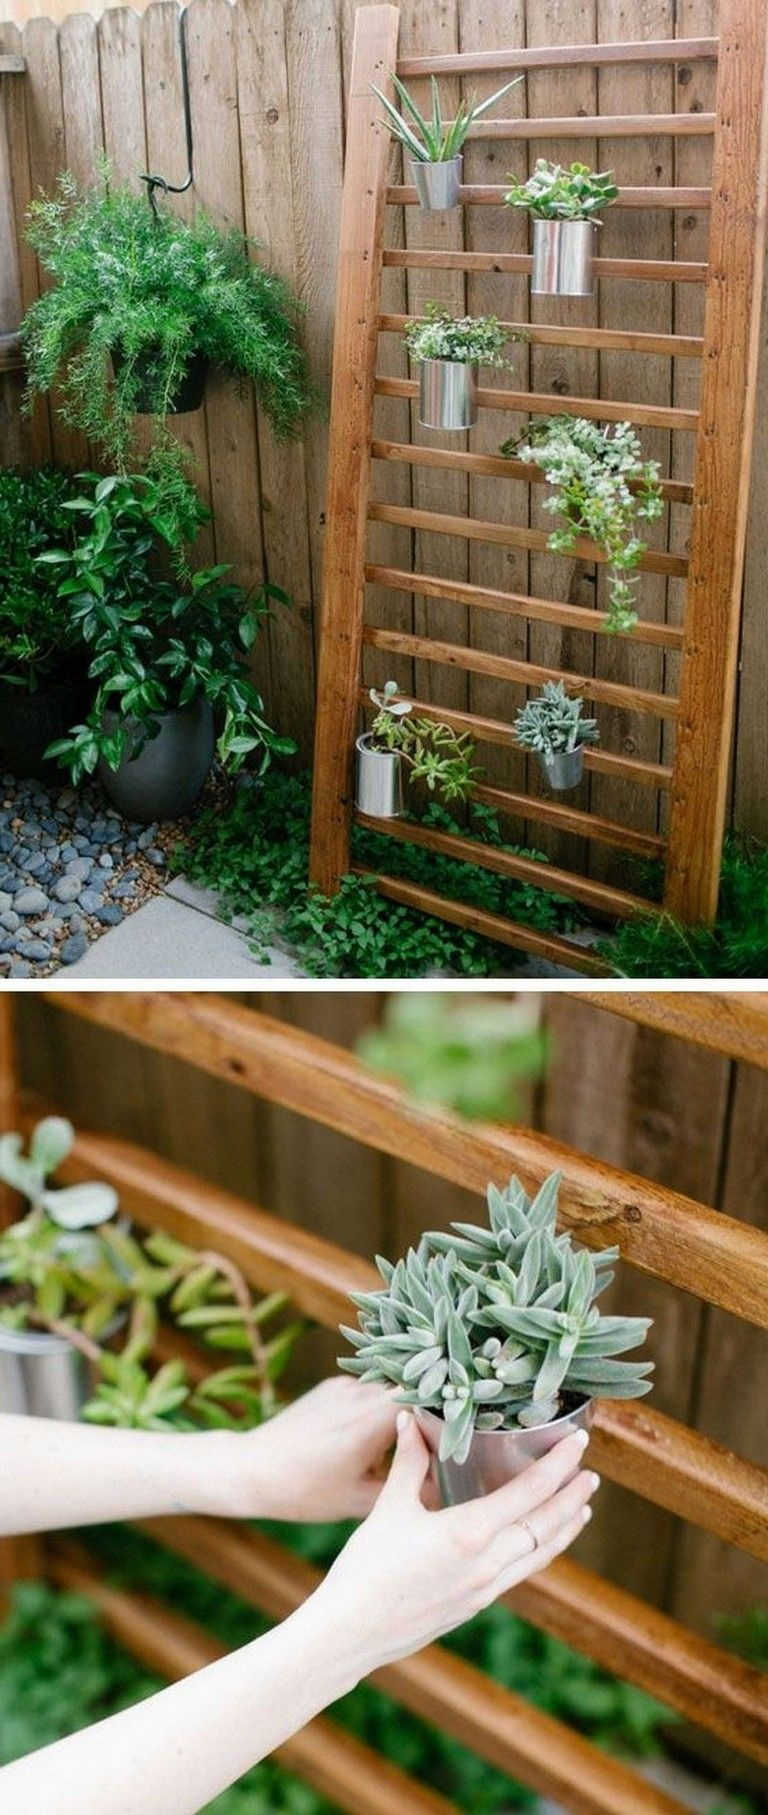 30 Optimum Backyard Design Ideas On A Budget That You Must ...